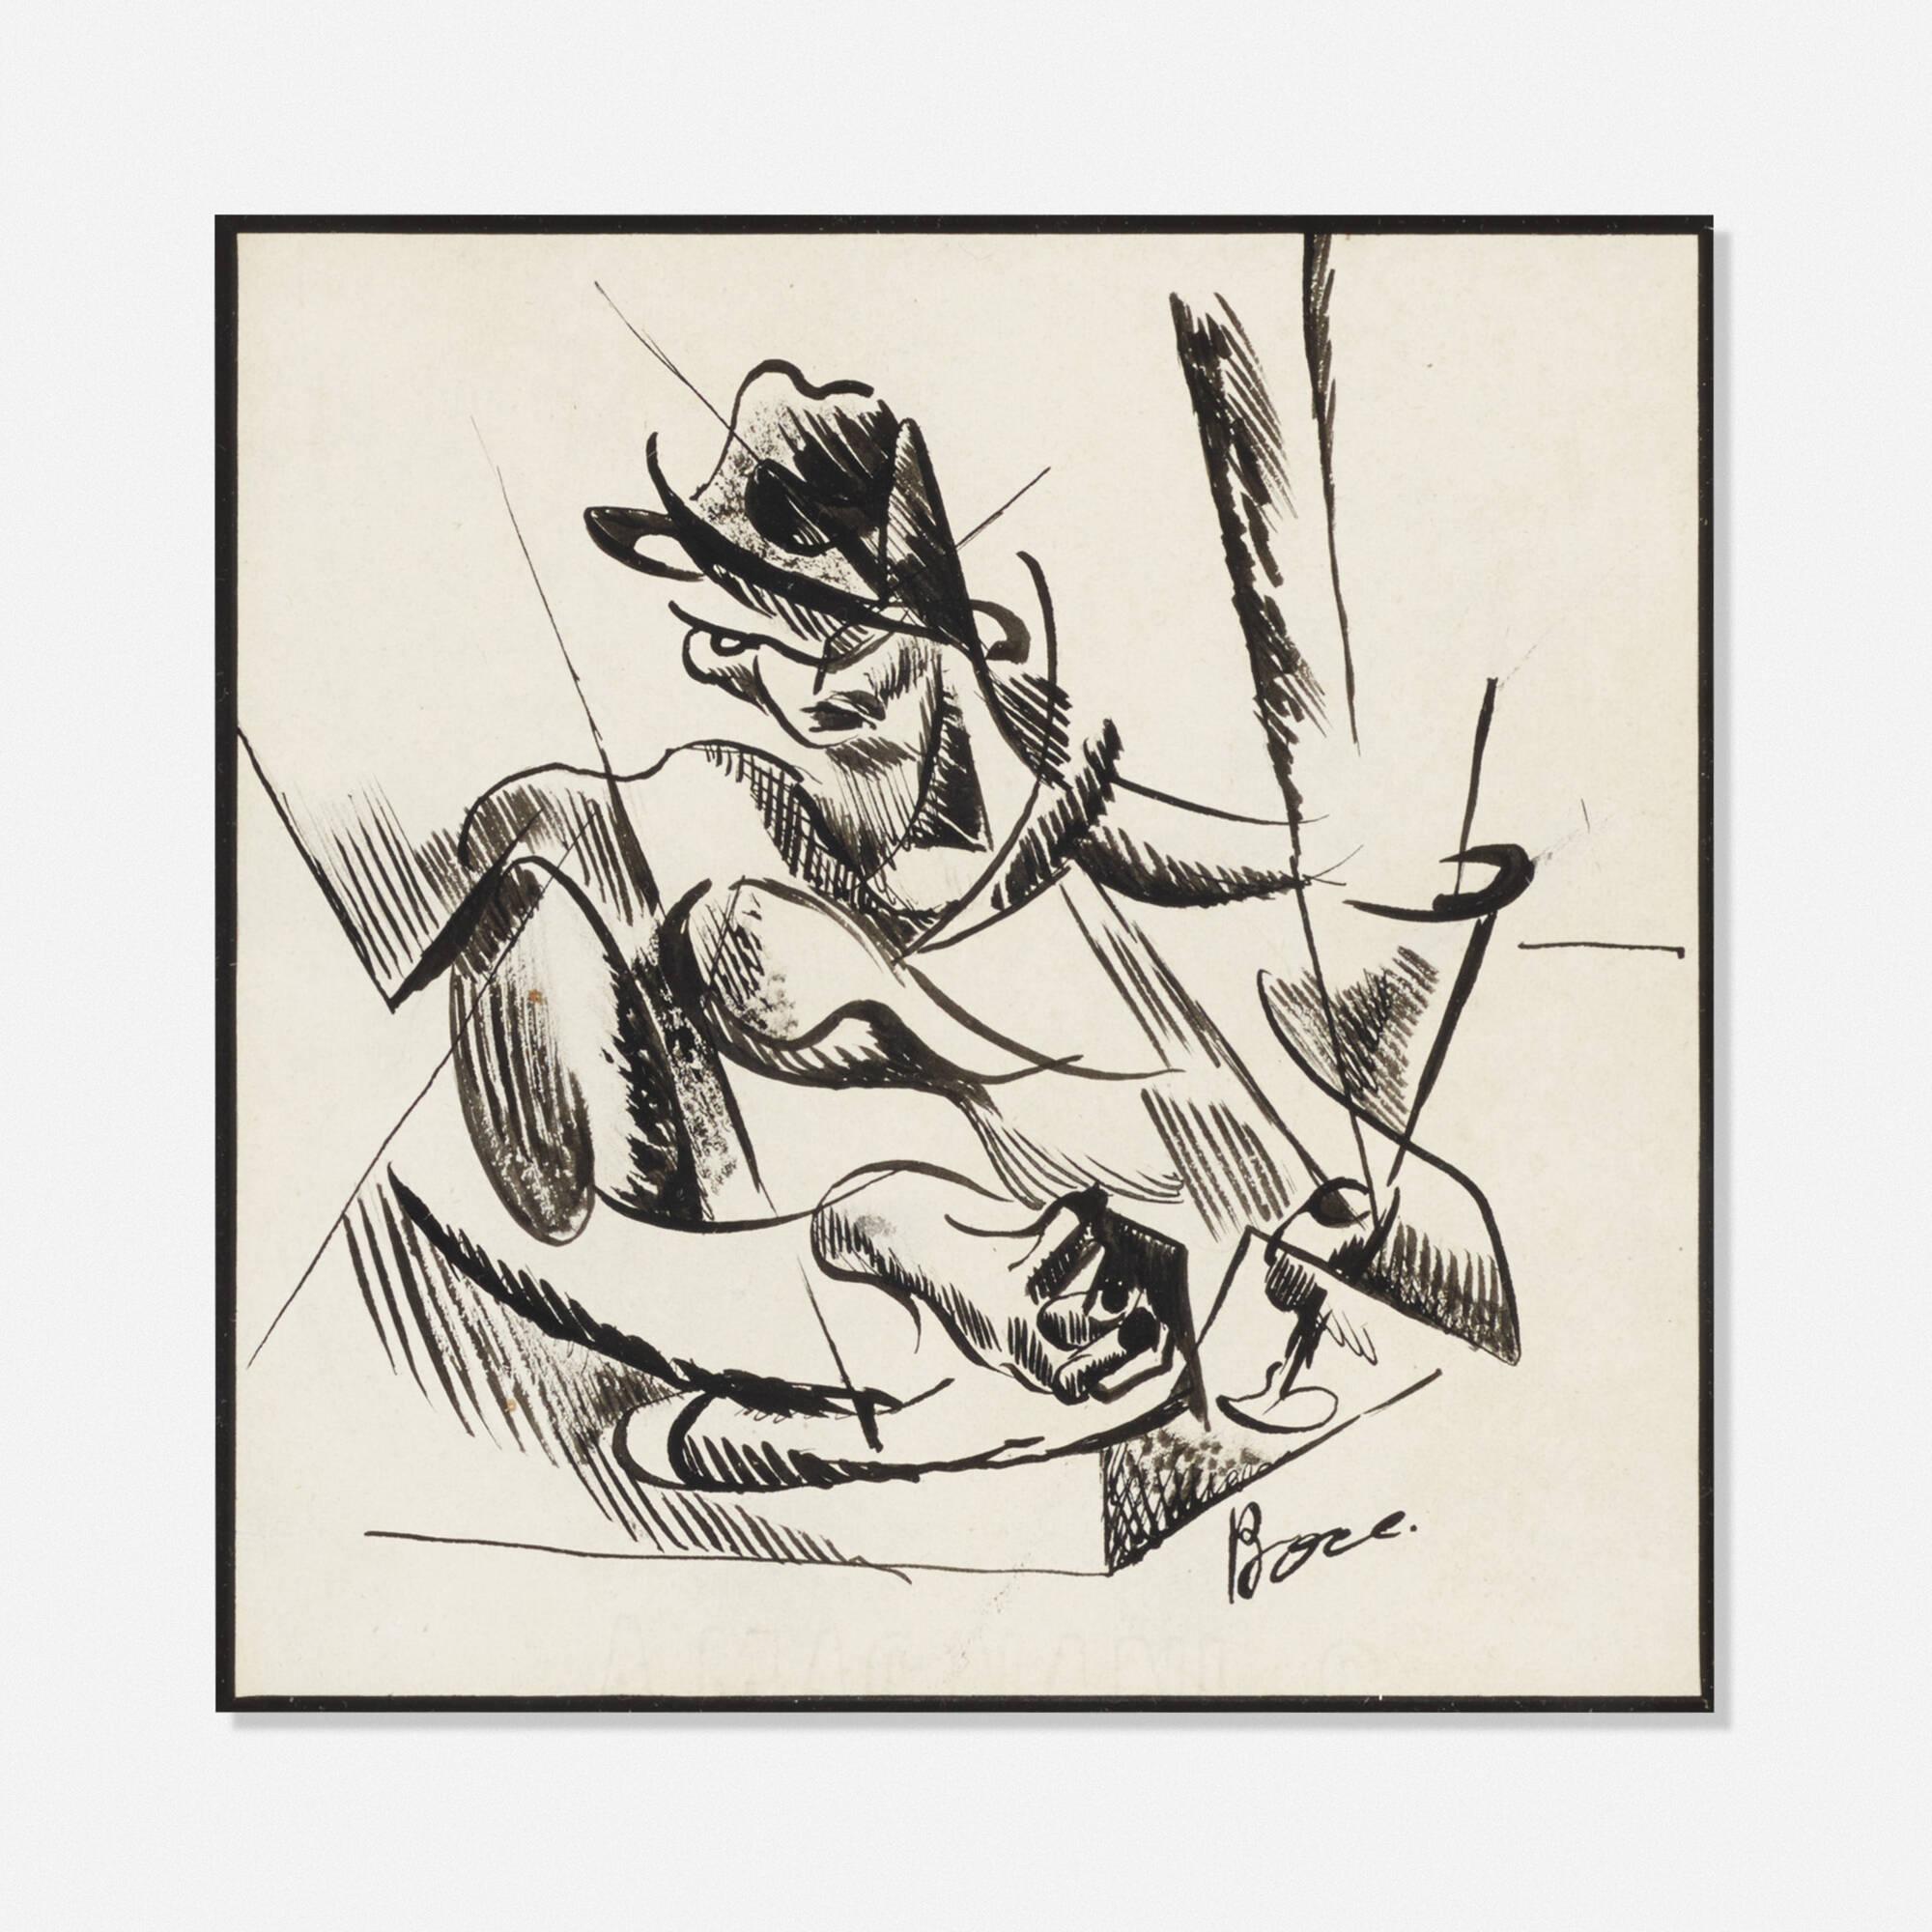 219: School of Umberto Boccioni / Untitled (1 of 1)